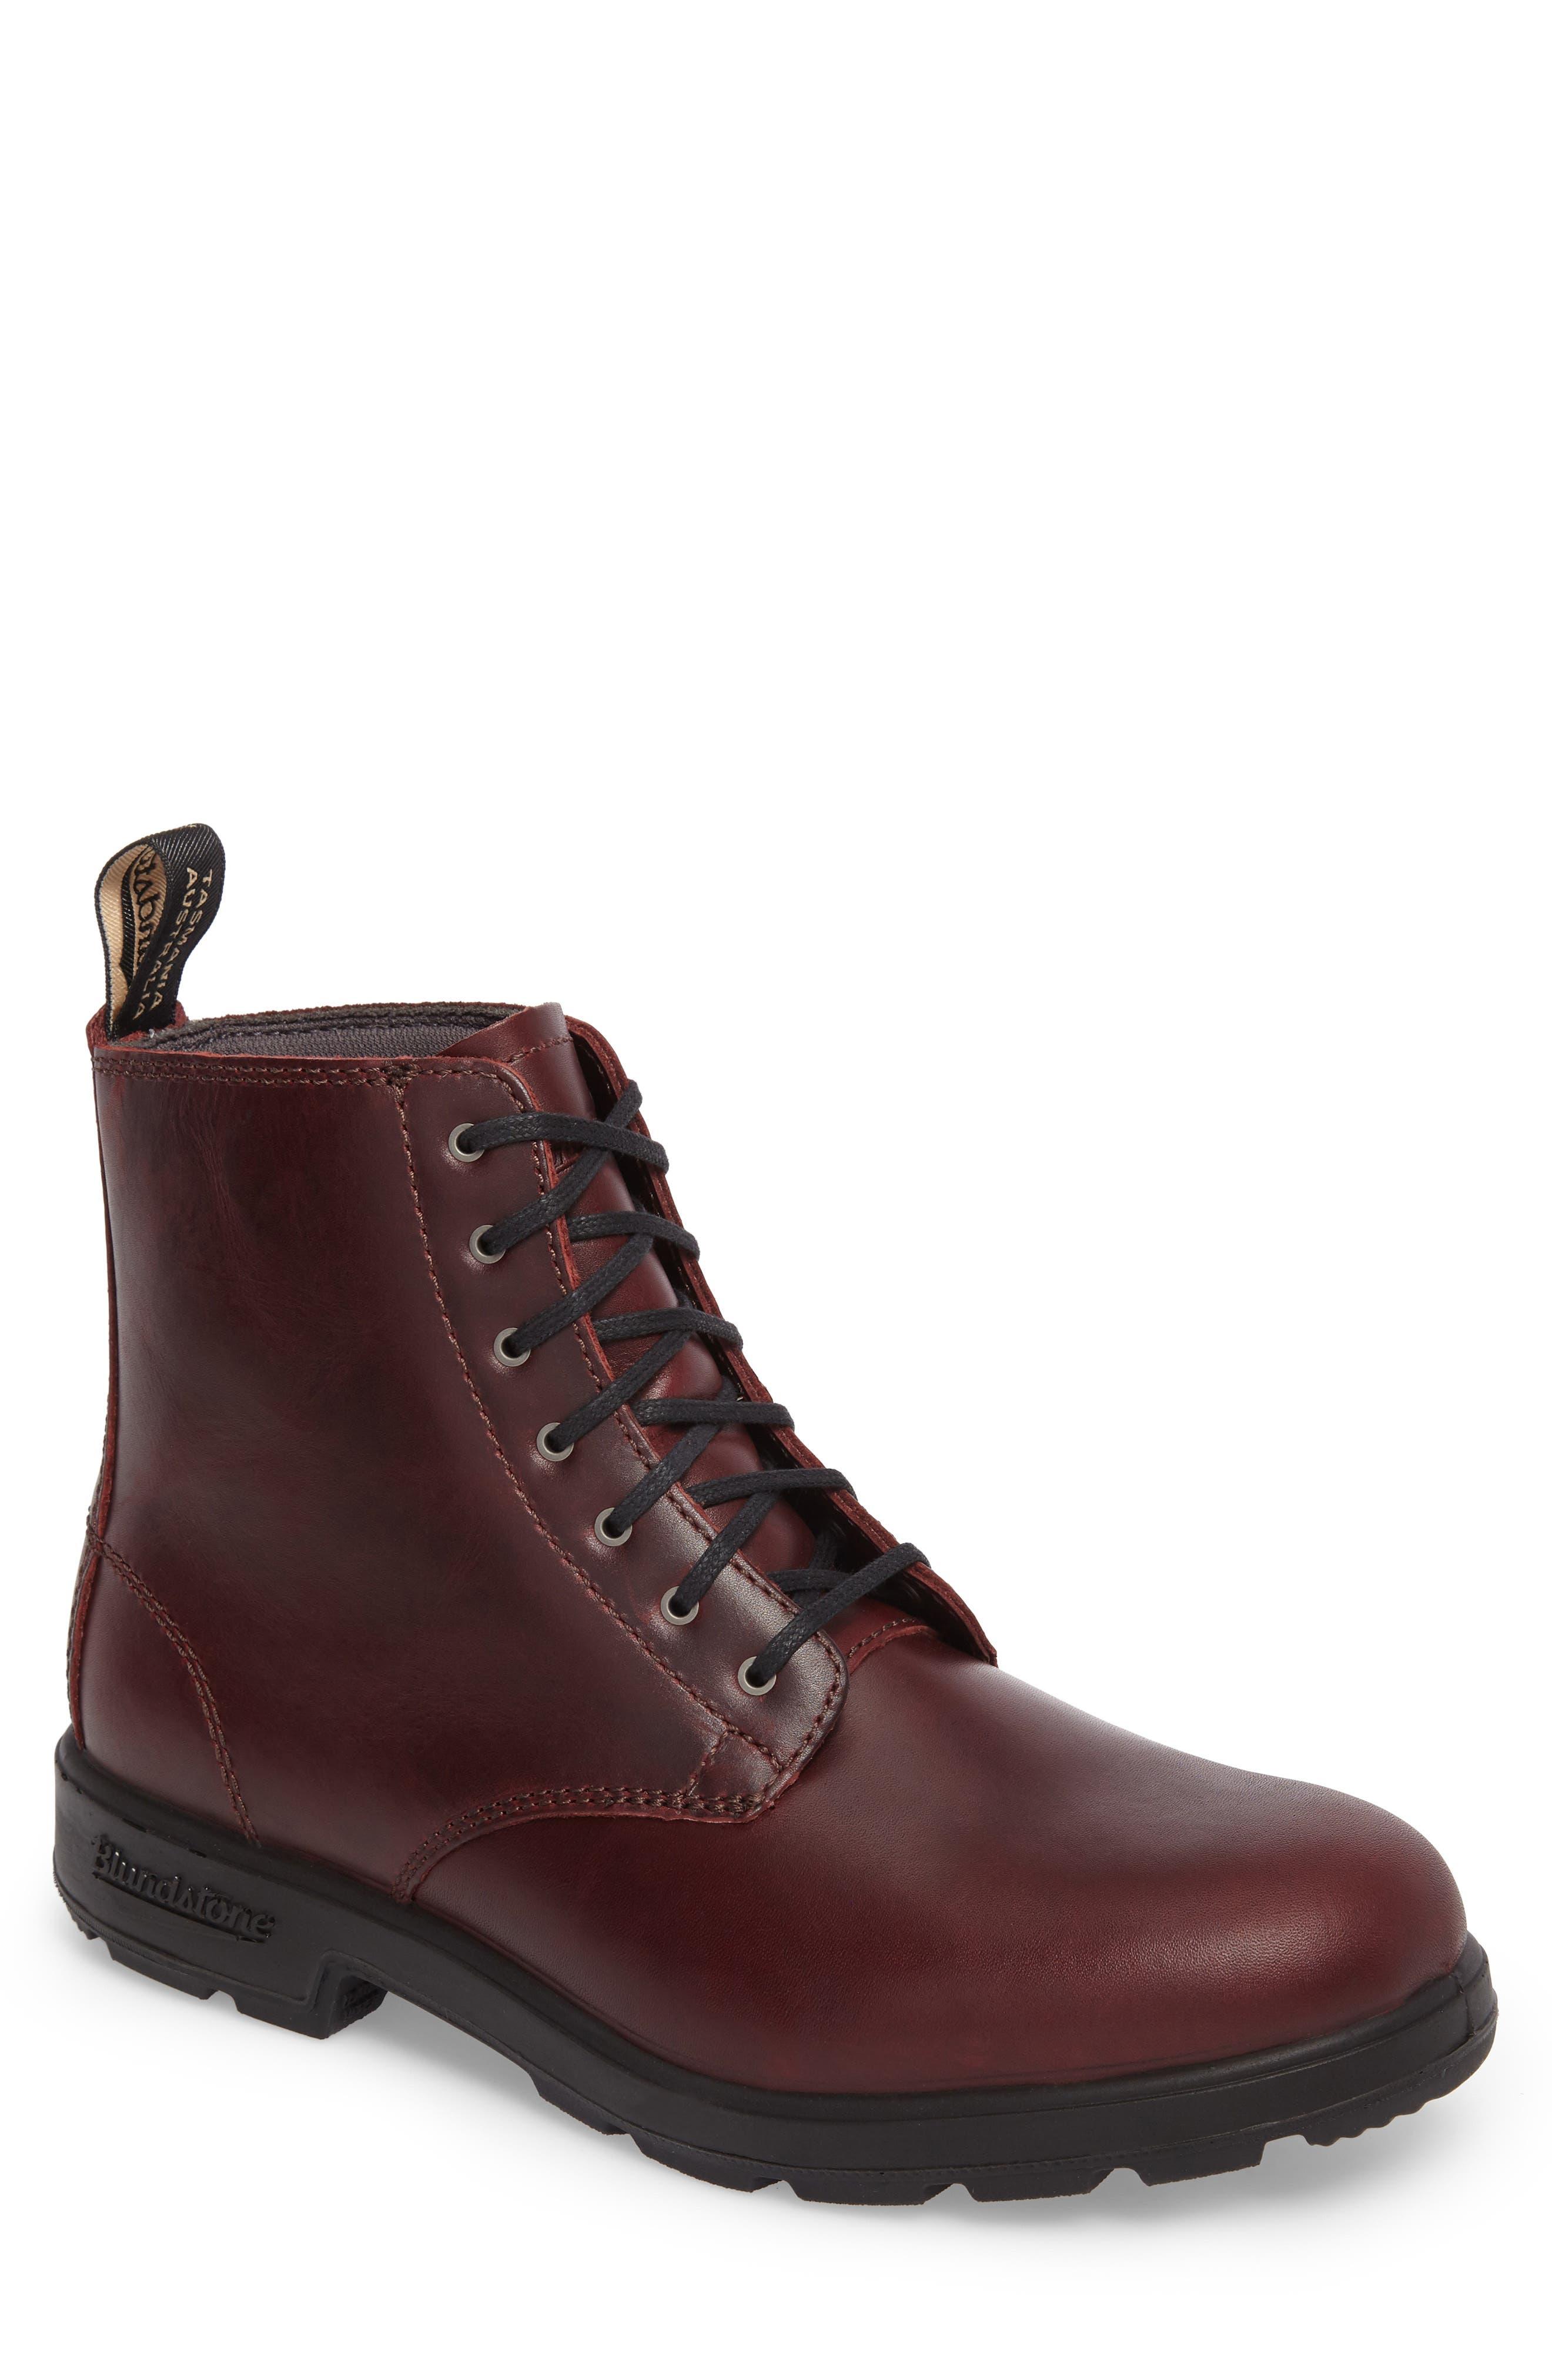 Blundstone Original Plain Toe Boot (Men)